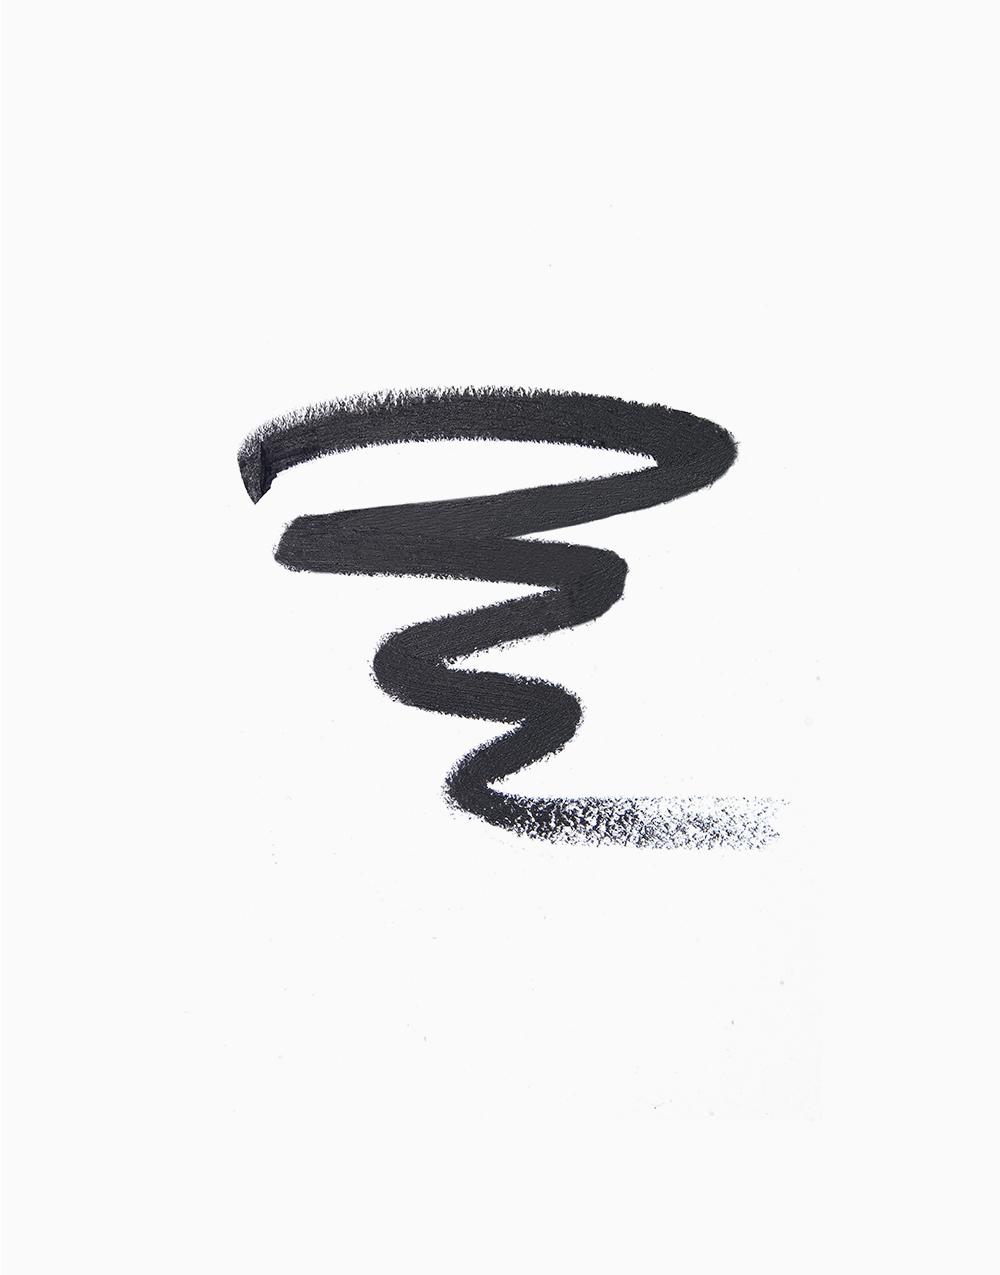 Dazzler Eyeliner Pencil by TPSY | 012 Black Eye